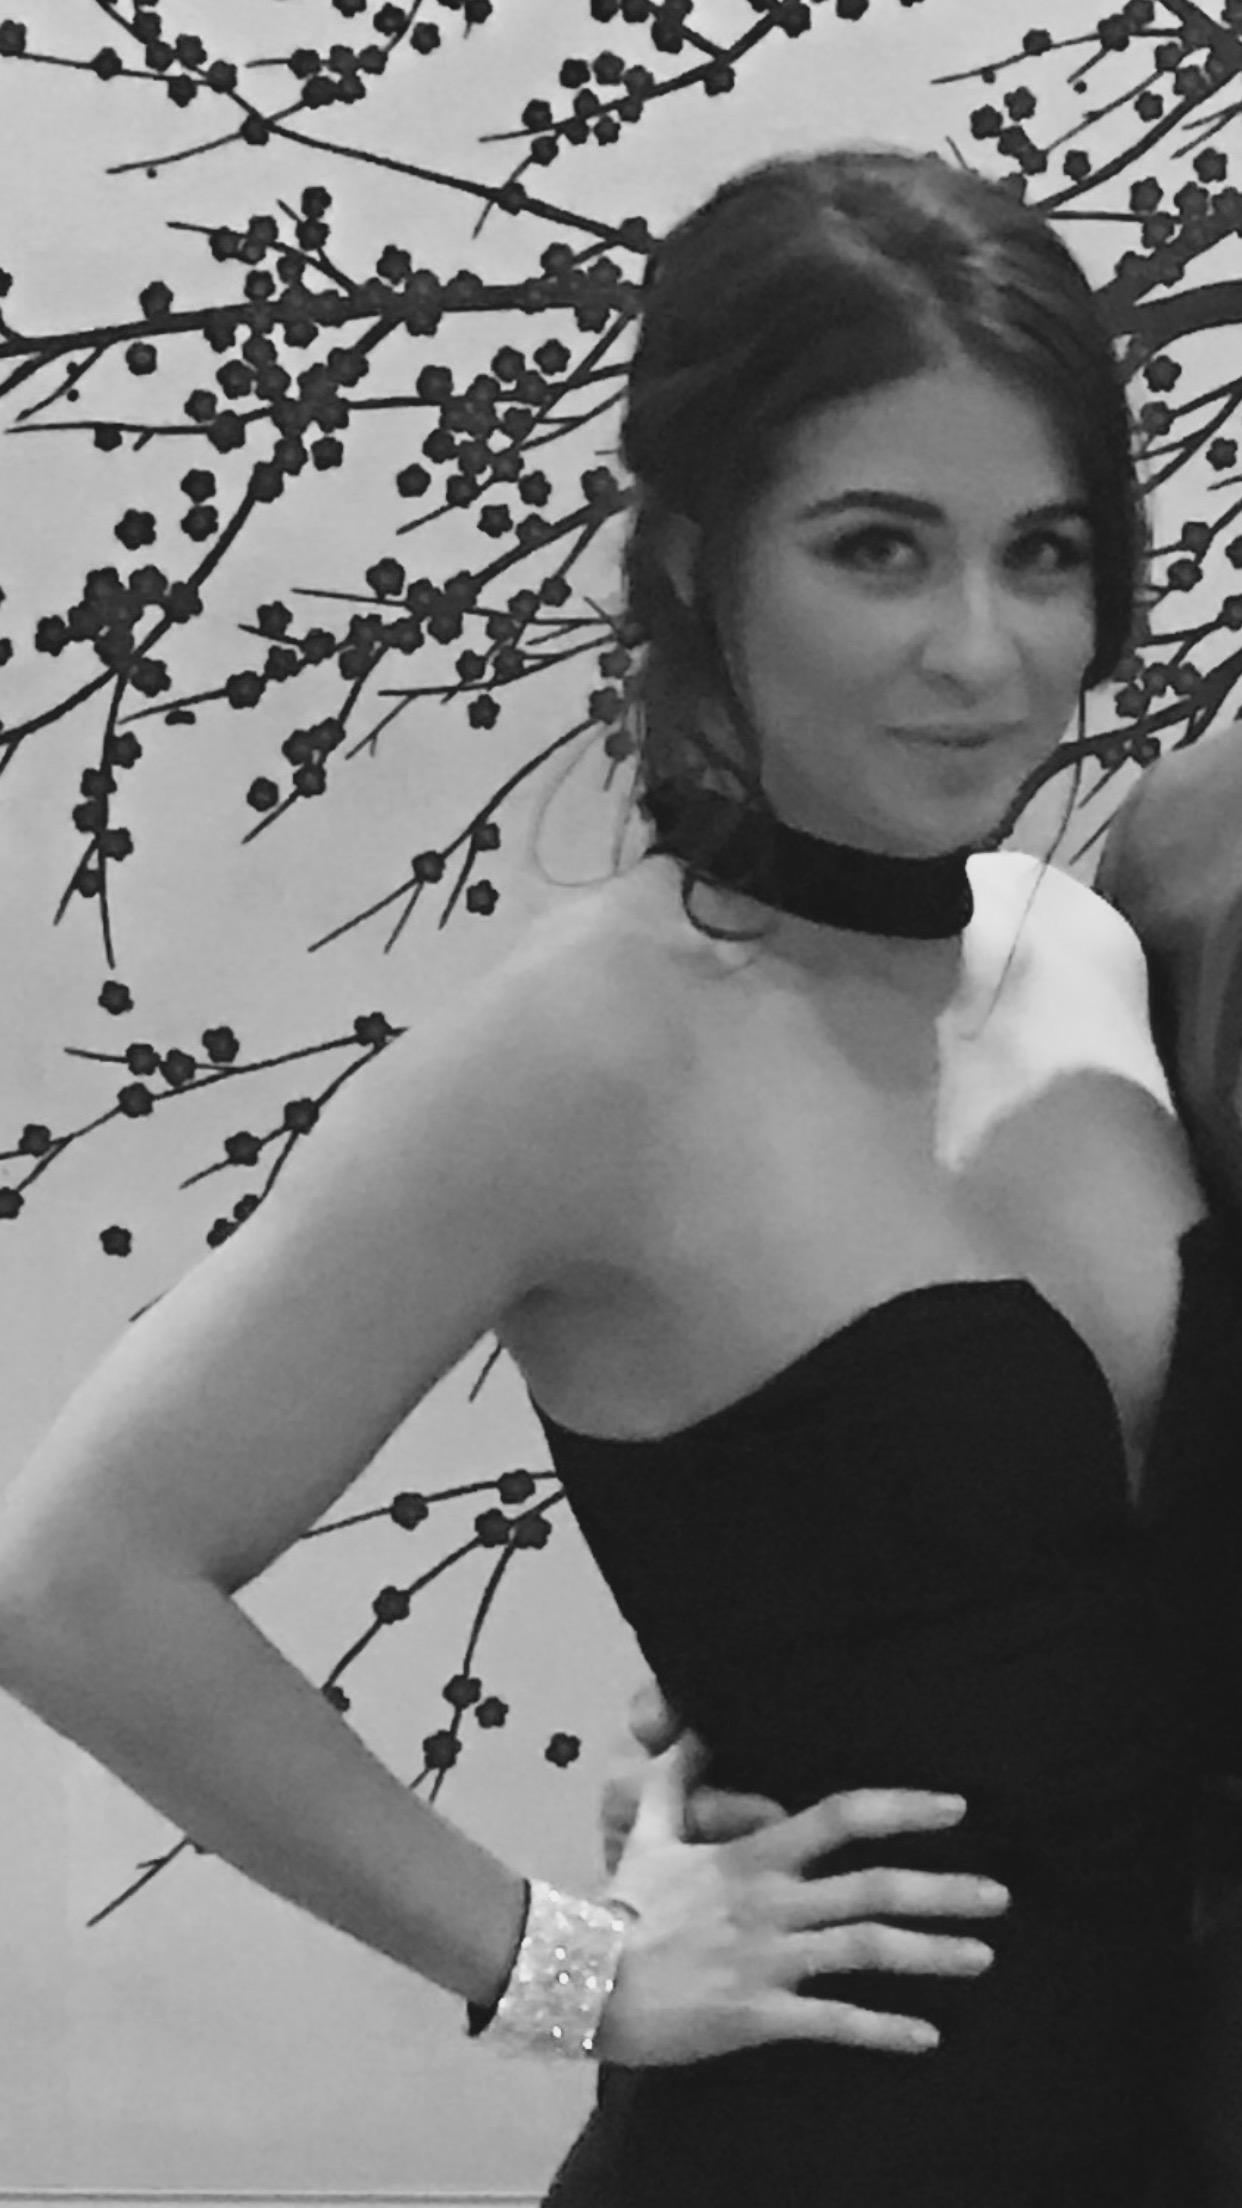 Danielle Griffith